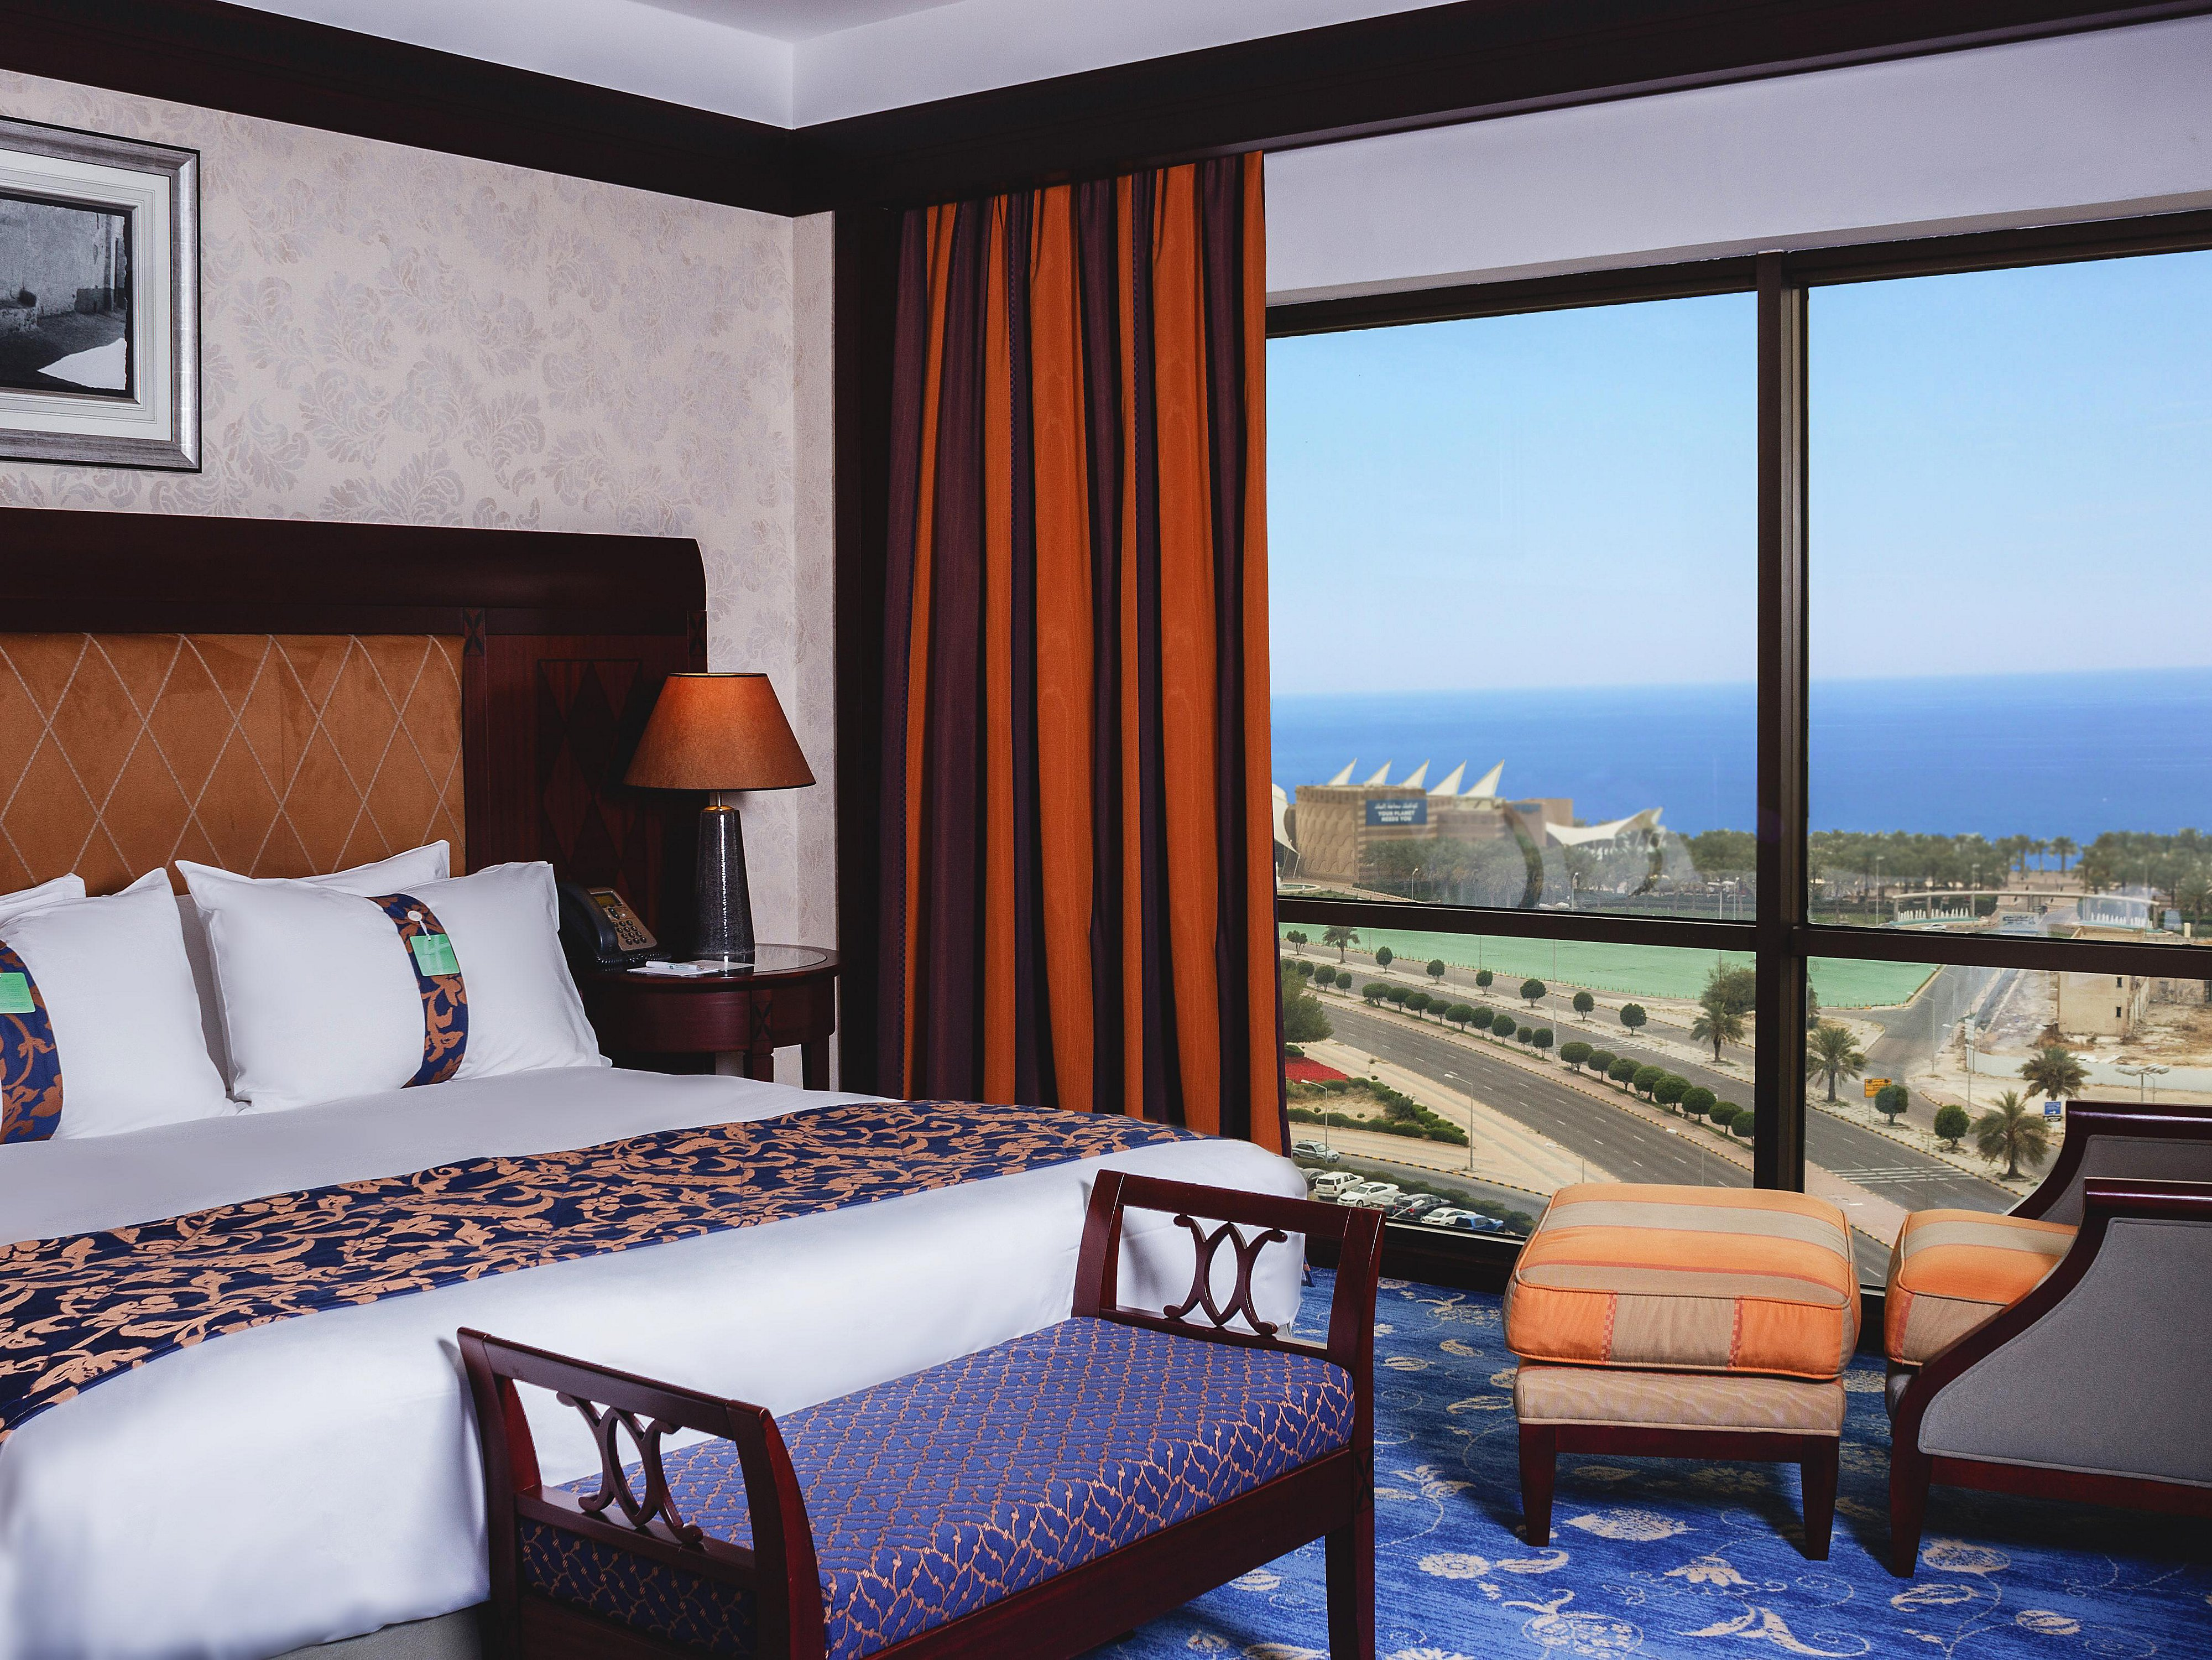 Holiday Inn Kuwait Hotel by IHG